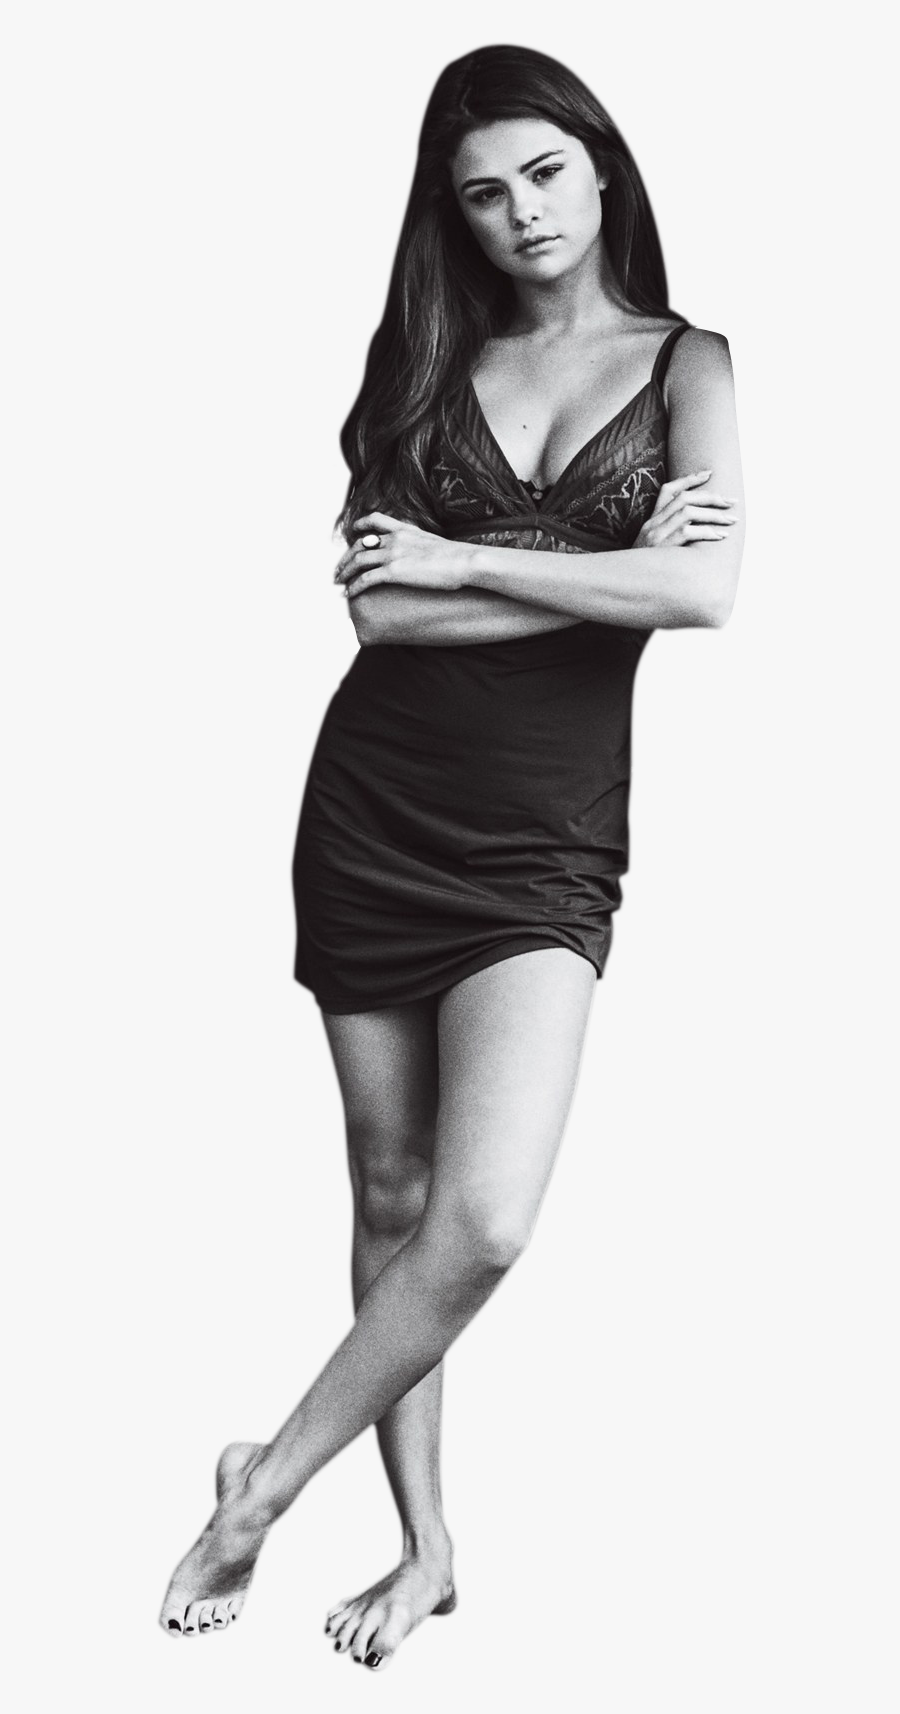 Selena Gomez Black And White Png Image - Selena Gomez Transparent Background, Transparent Clipart